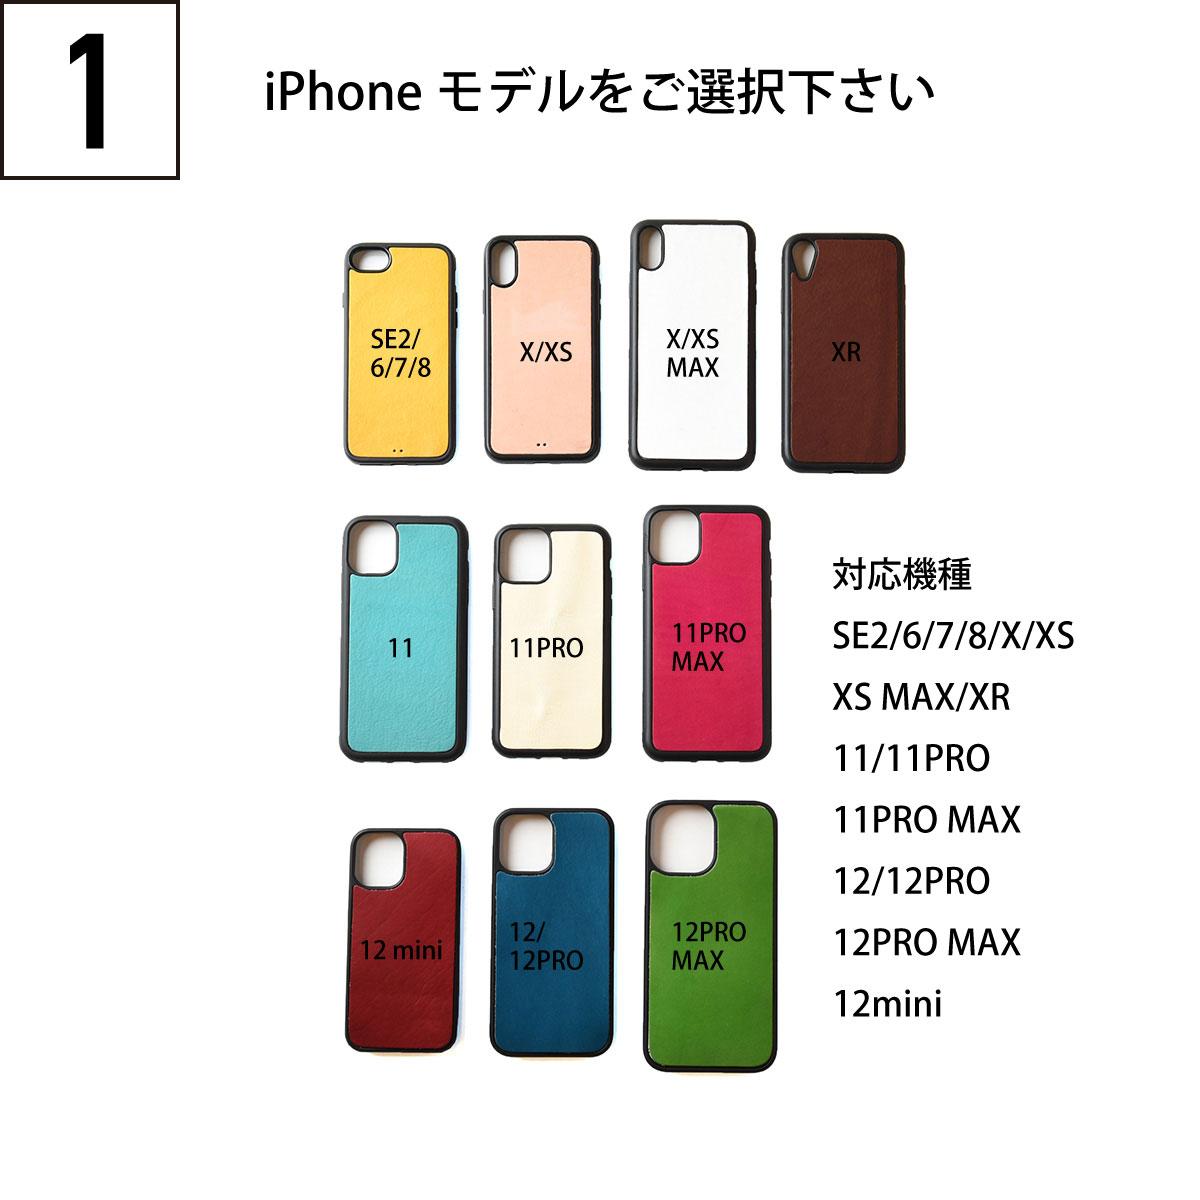 iPhoneOpenCase:   Design E_1:ミニマーク刻印(スマイル)+名入れ